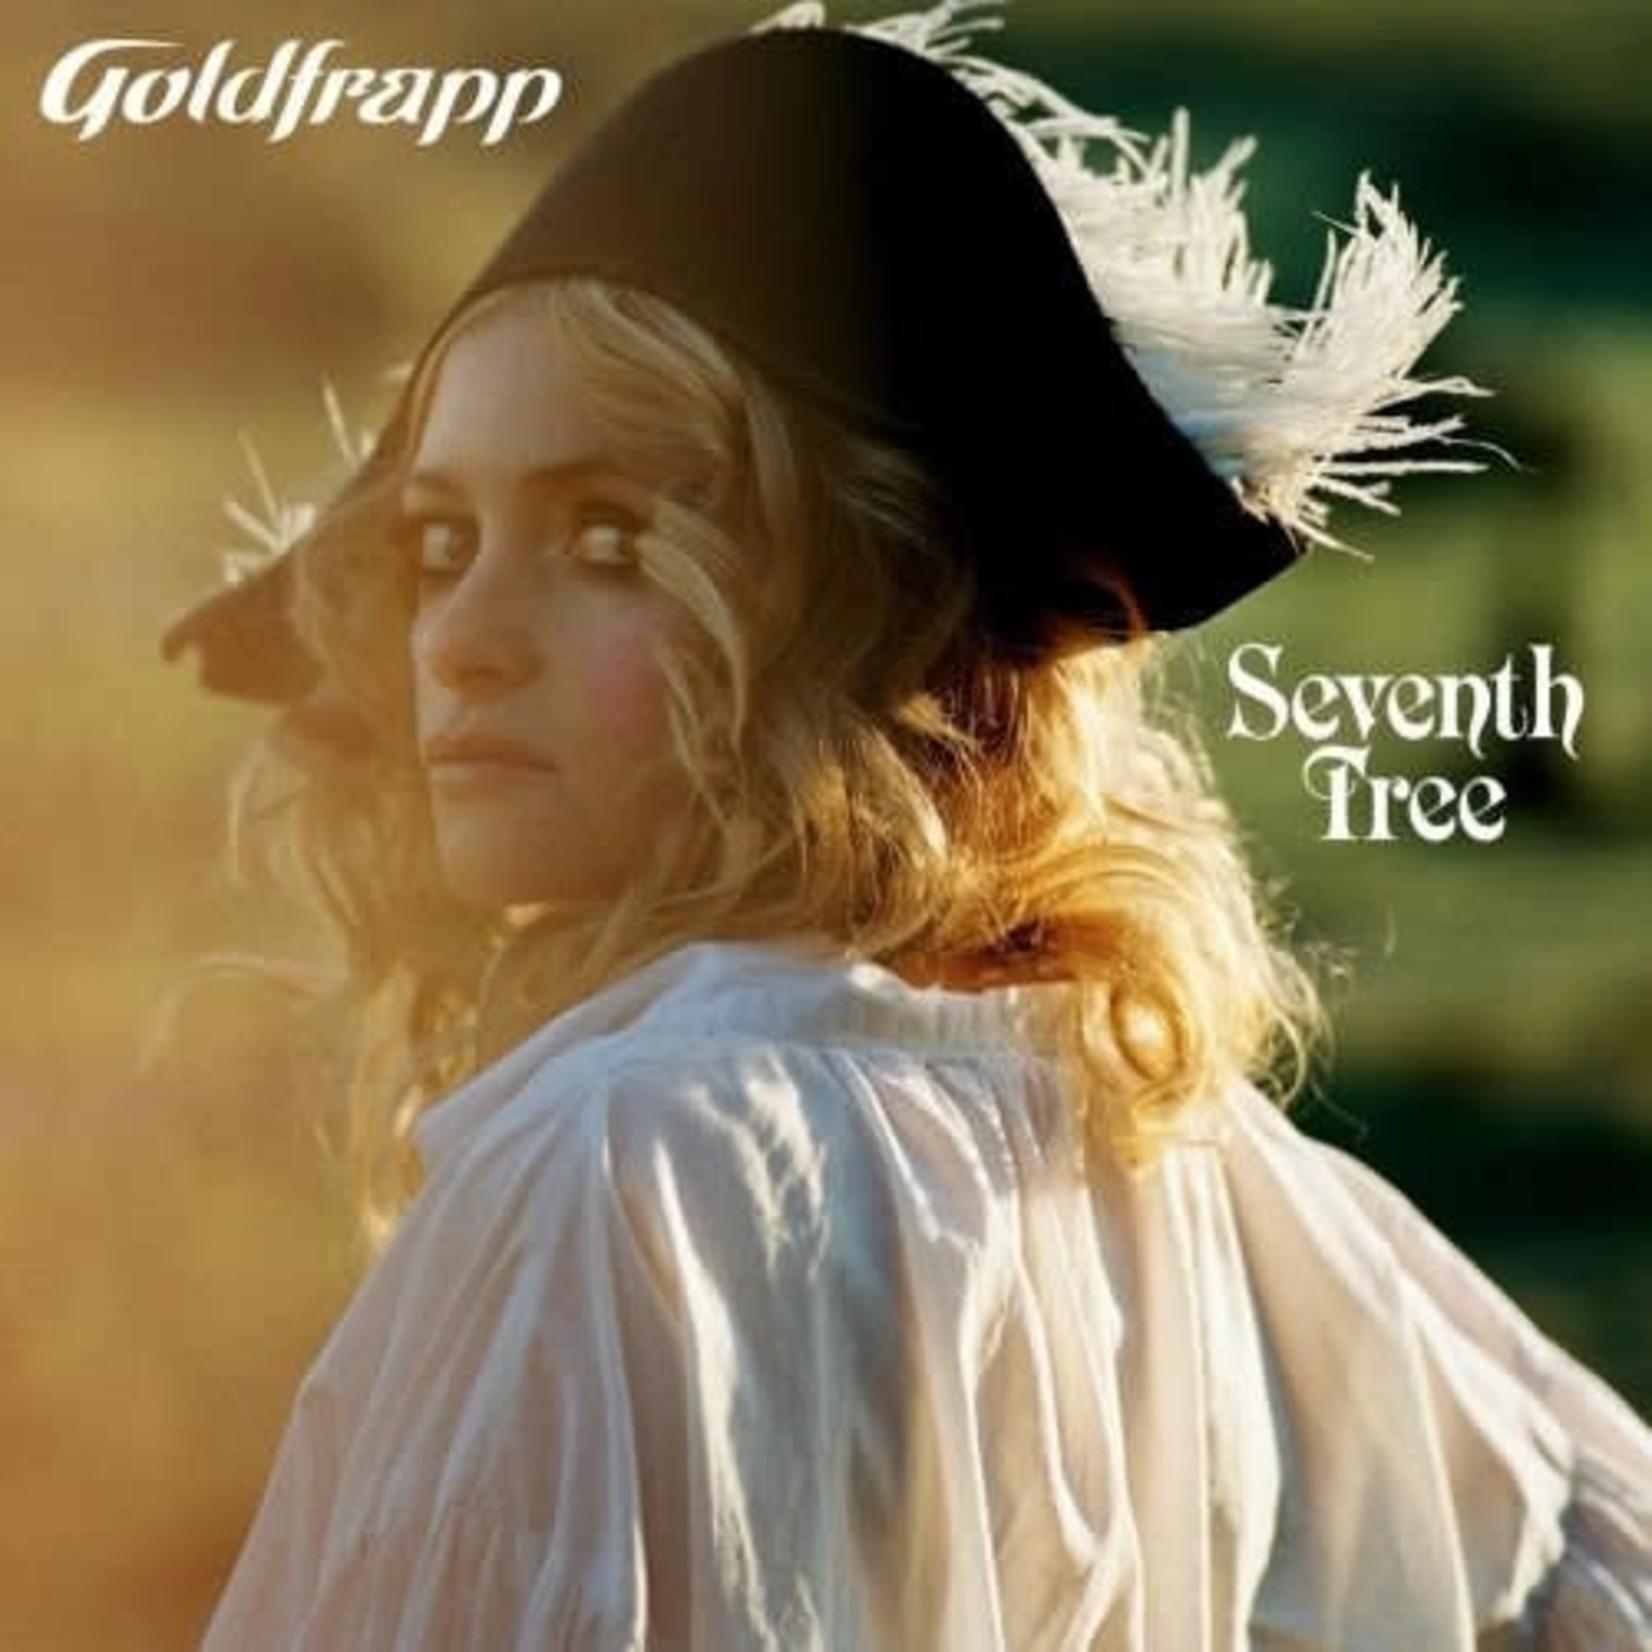 [New] Goldfrapp: Seventh Tree (Limited Ed., yellow vinyl)